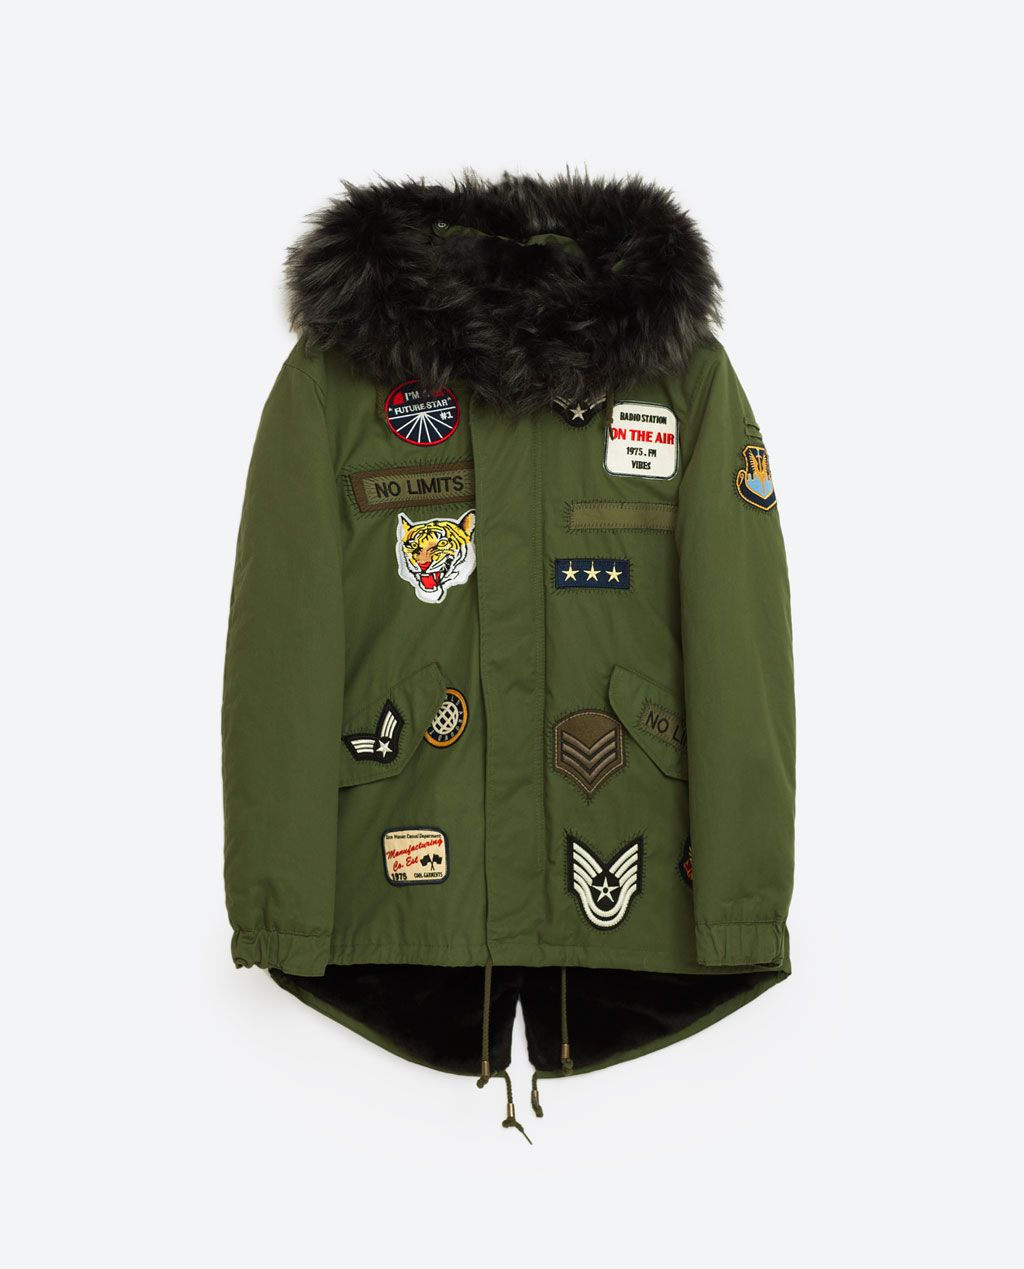 L Parka capucha Zara abrigo con de mujer verde Sz 14